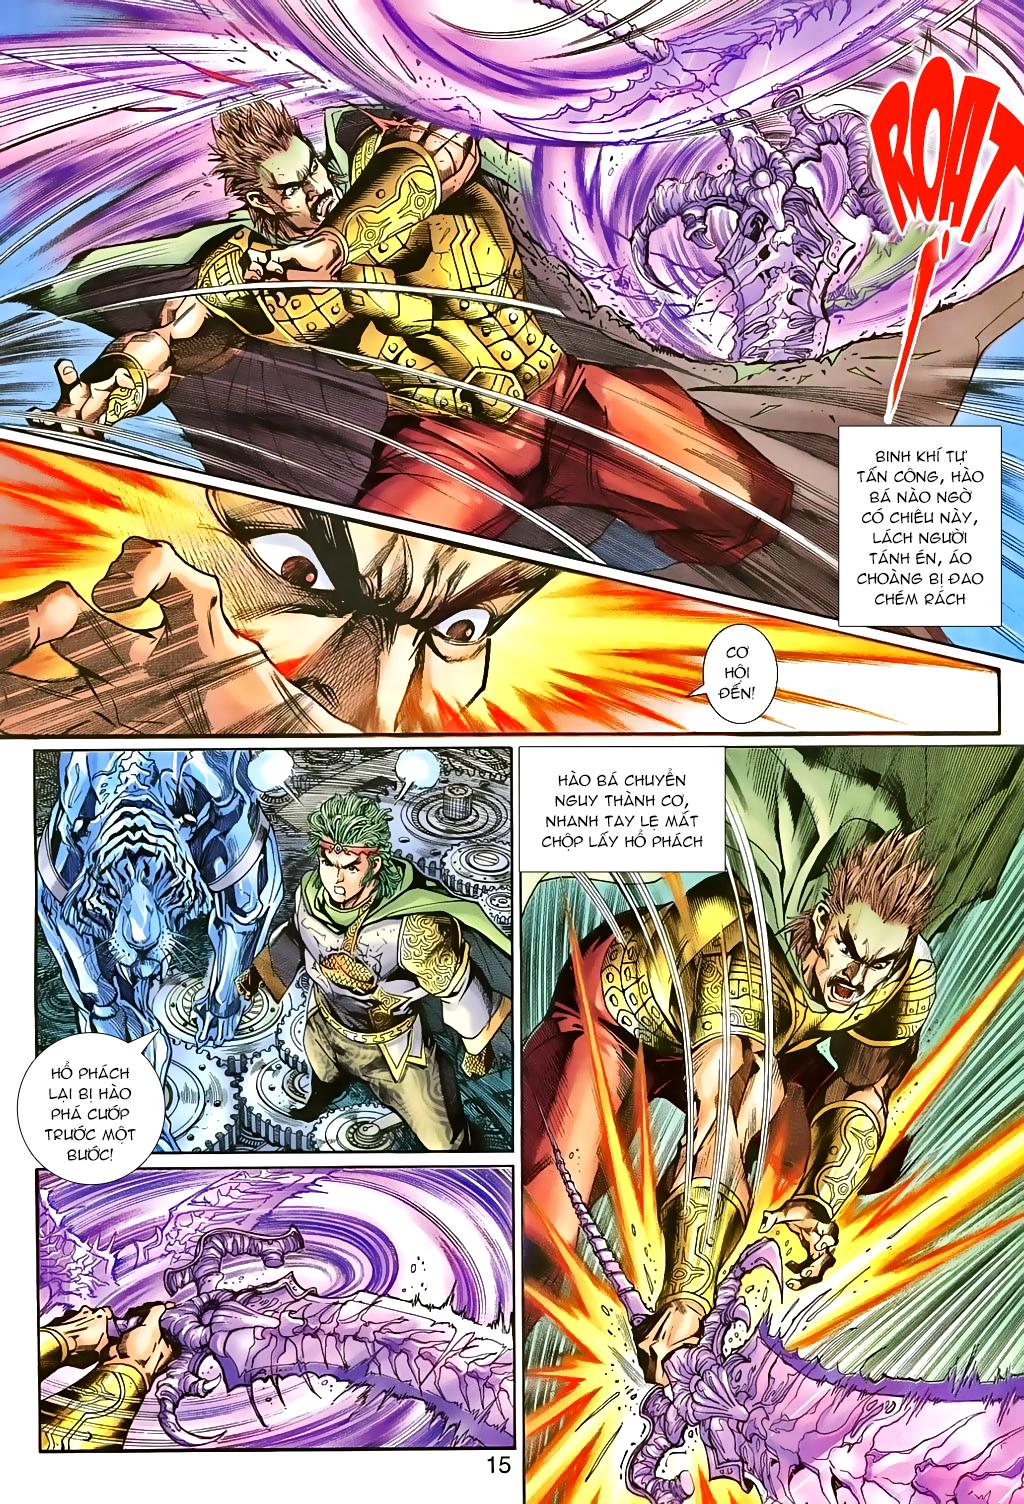 Thần binh huyền kỳ 3 - 3.5 Chapter 81 - Hamtruyen.vn